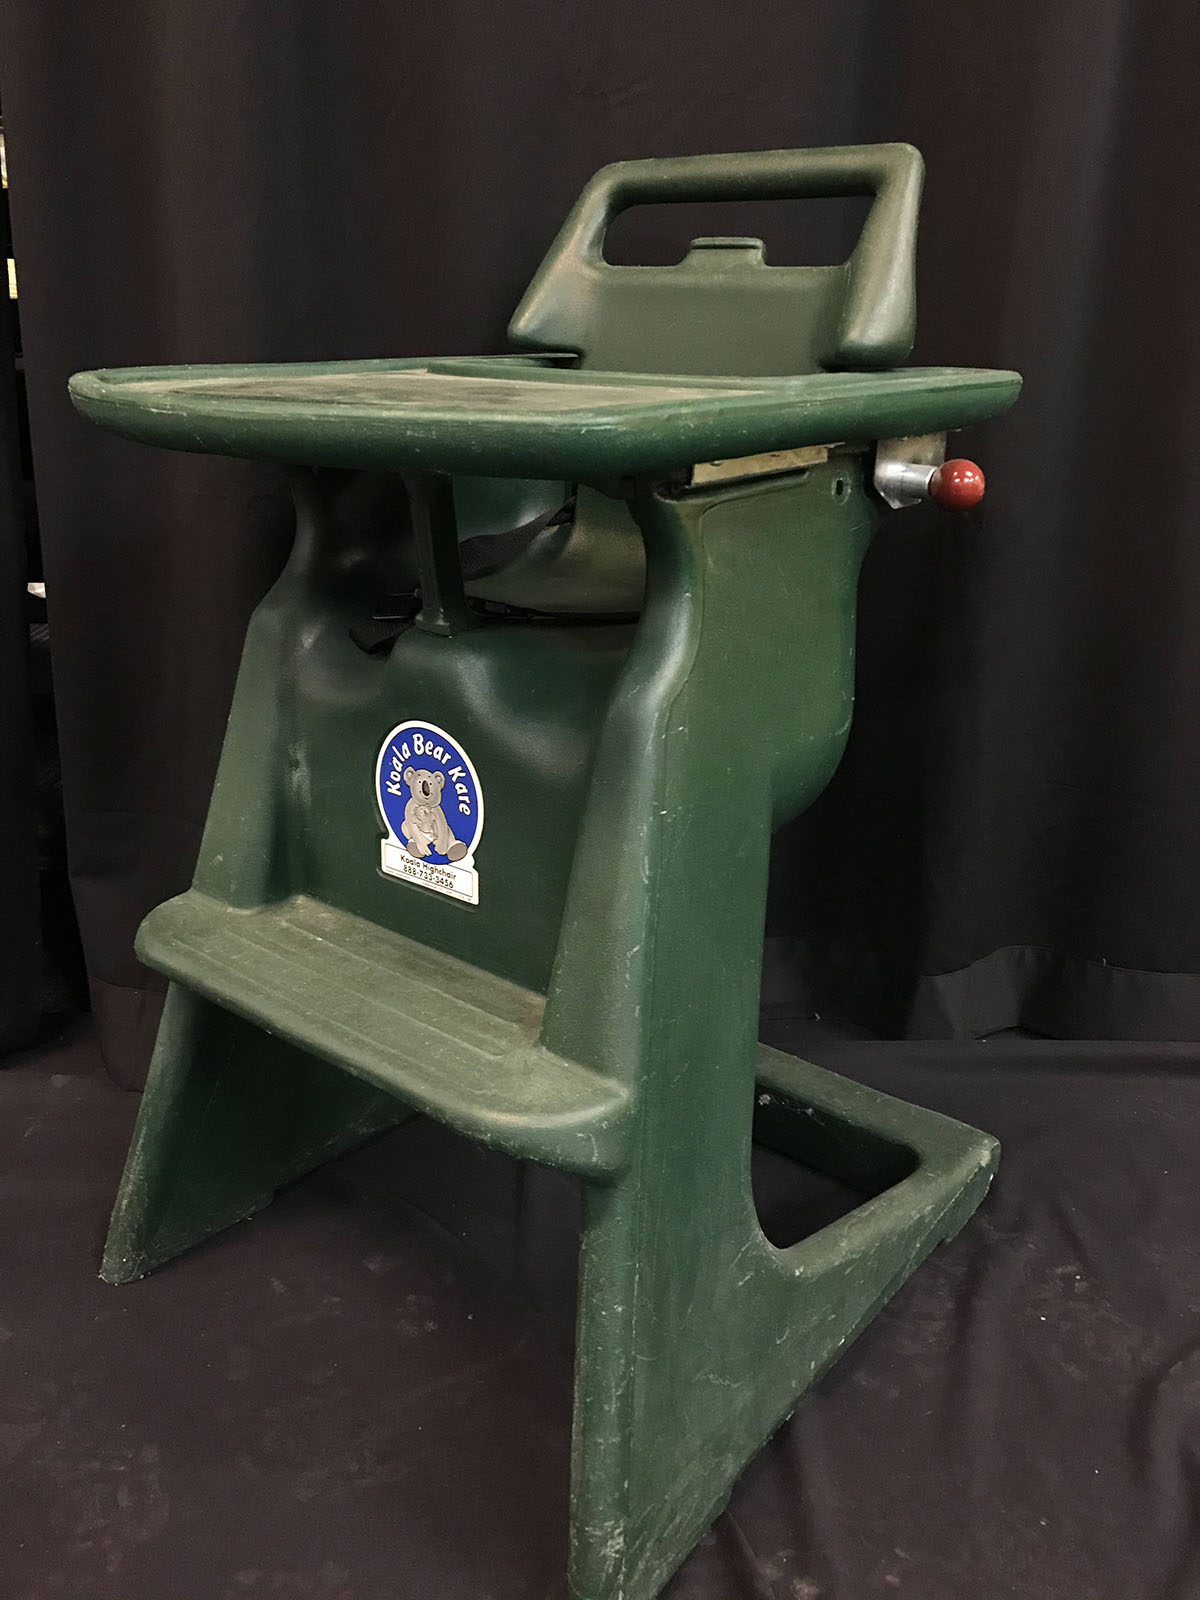 High chair (green, plastic)